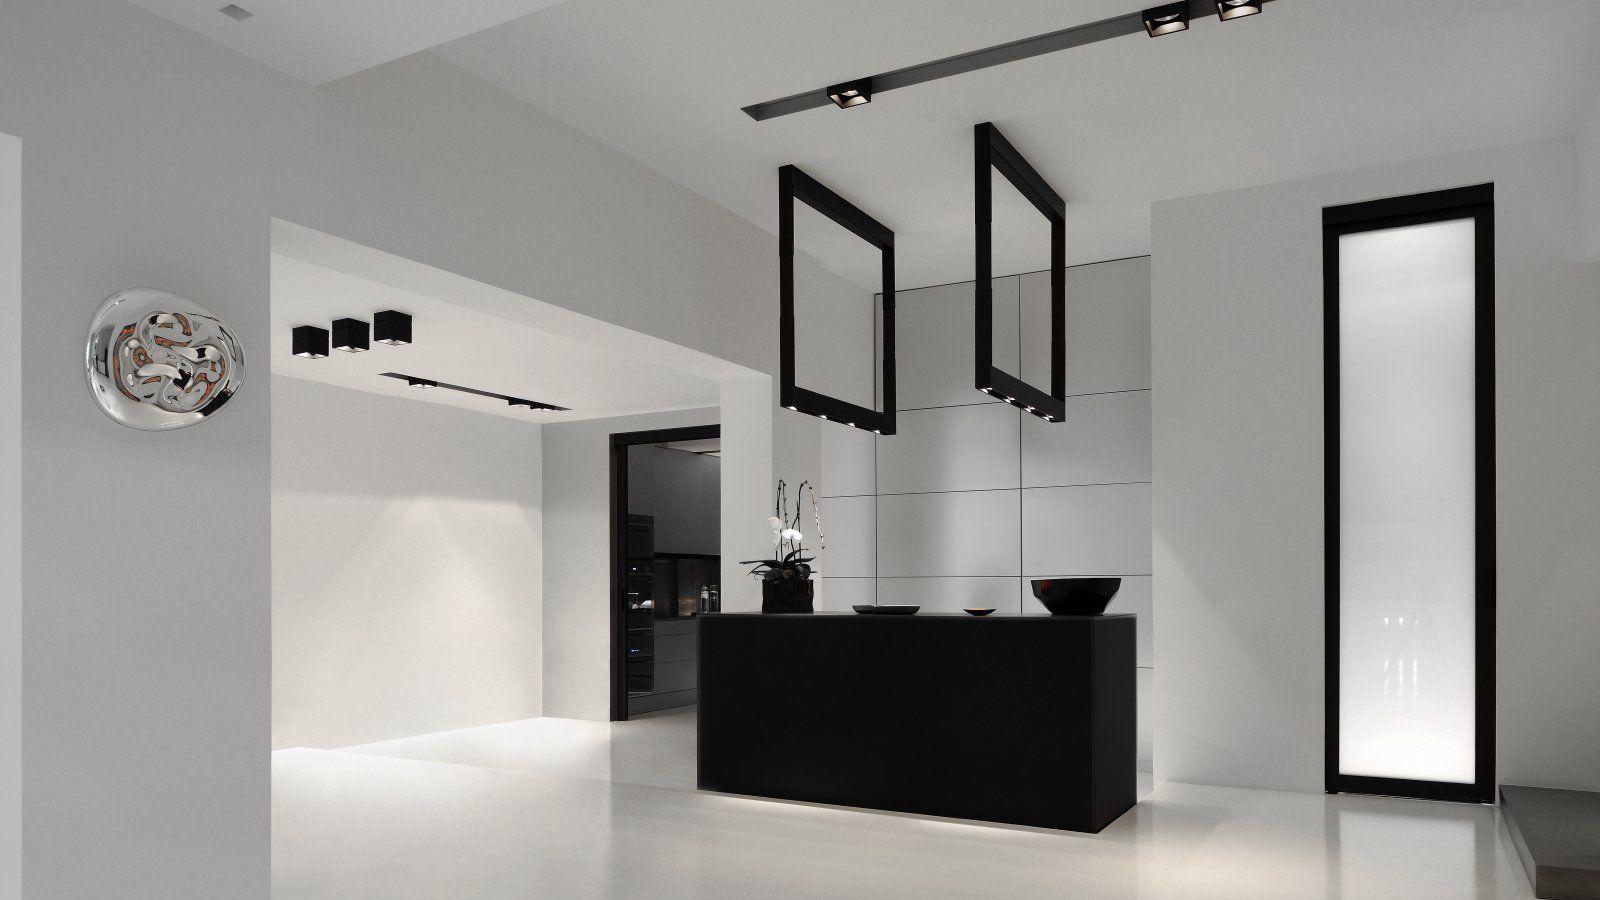 Appartment paris lighting by kreon 3d visualisation for Kreon lampen